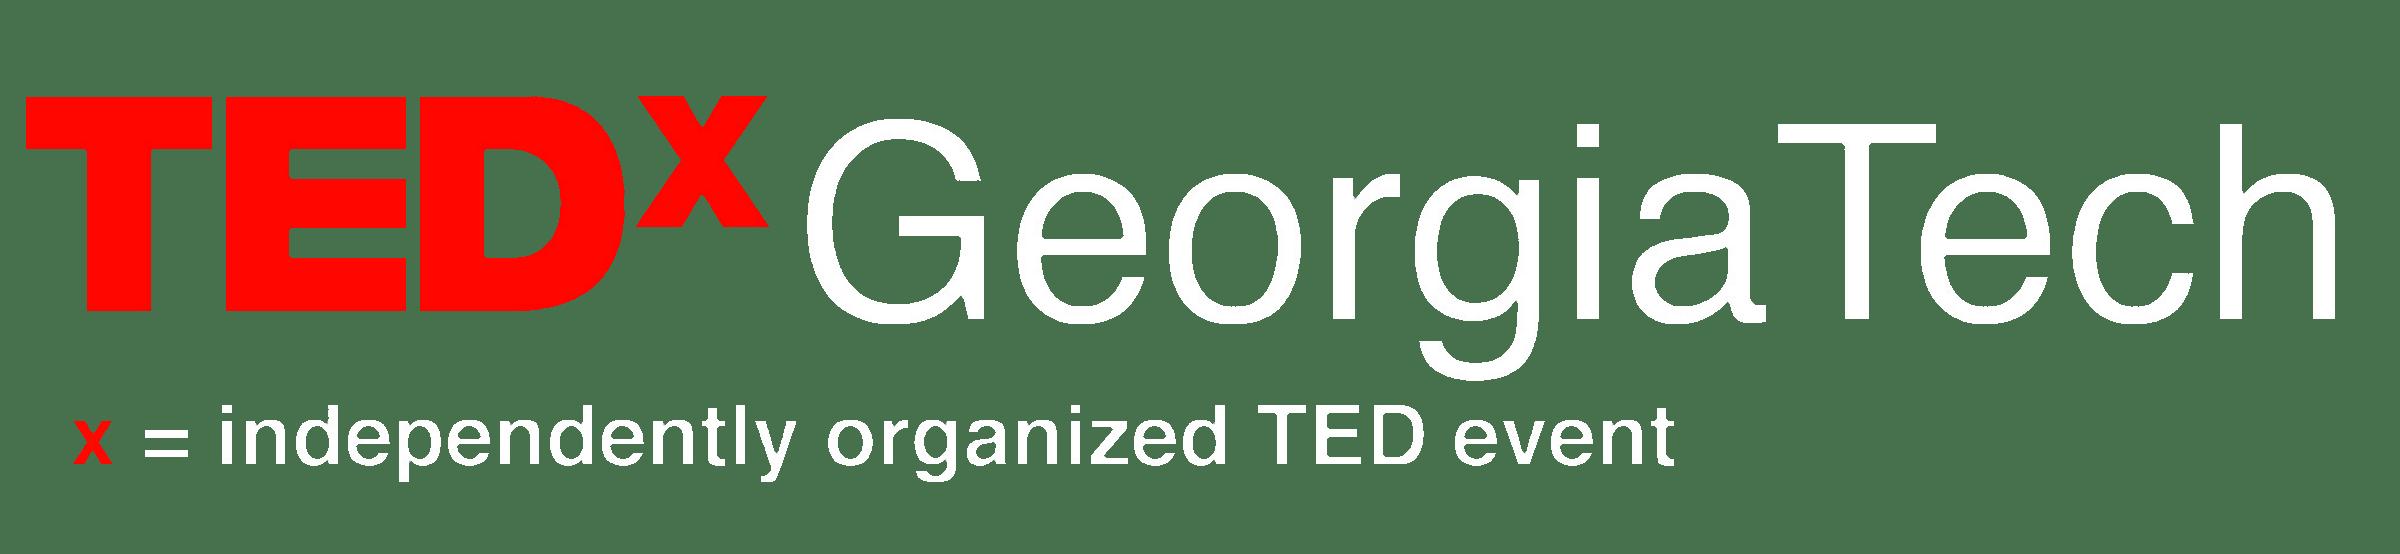 TEDxGeorgiaTech